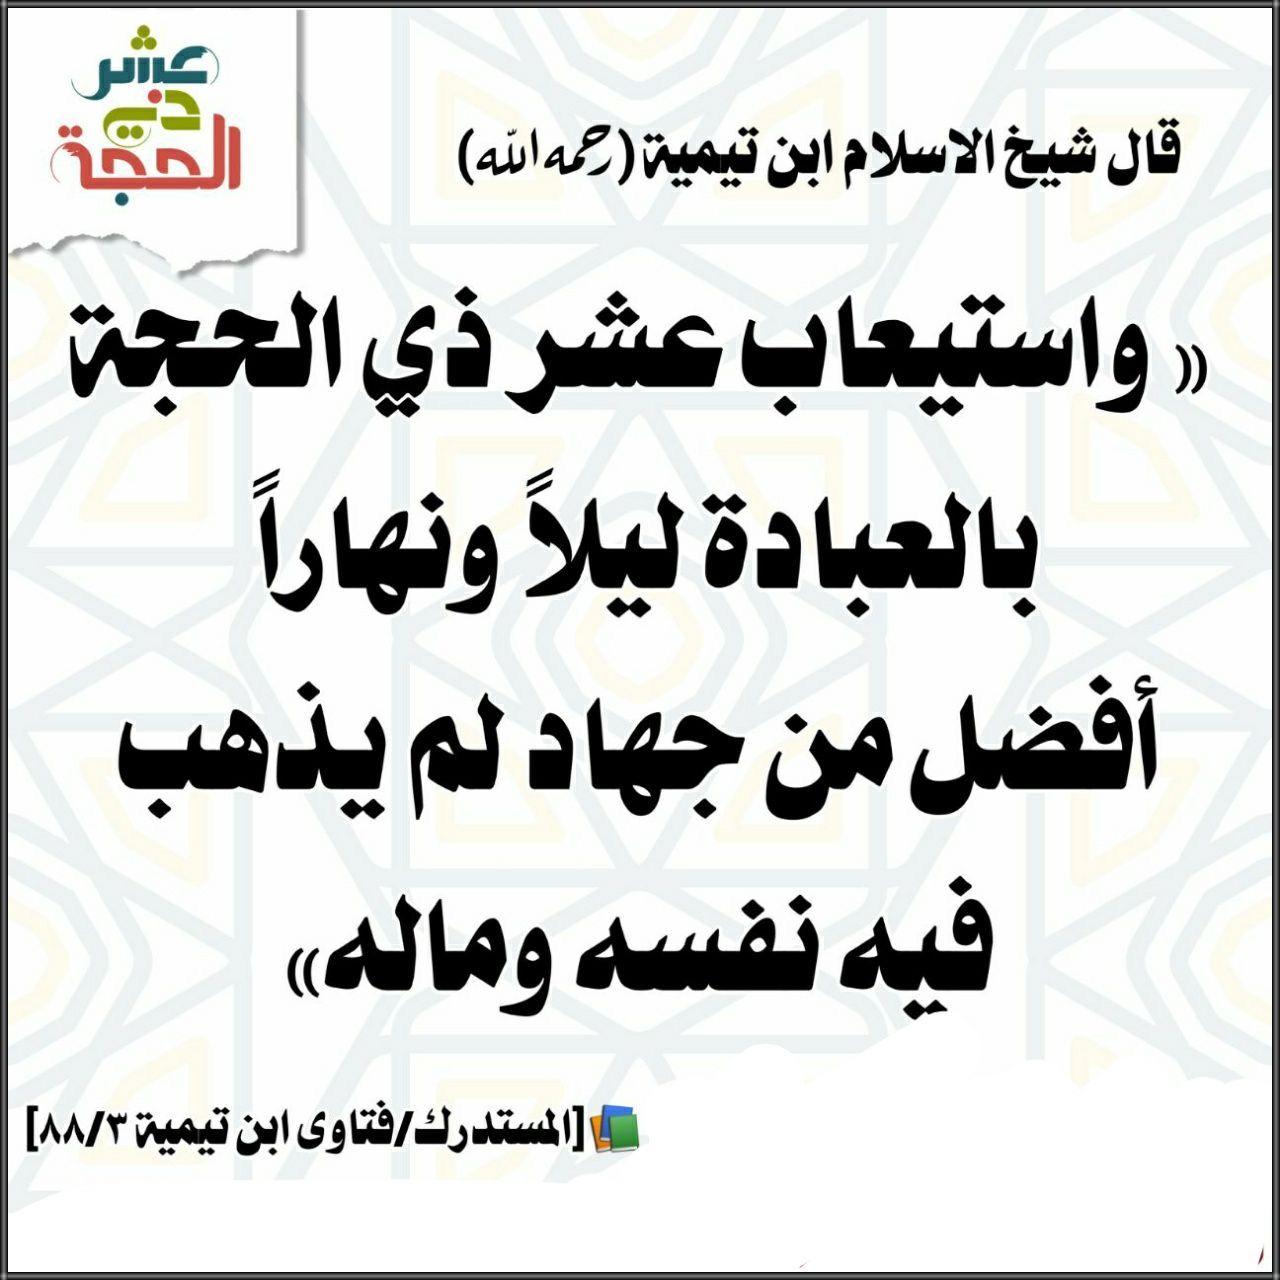 Pin By الأثر الجميل On أقوال الصحابة والعلماء Islamic Quotes Arabic Quotes Quotes